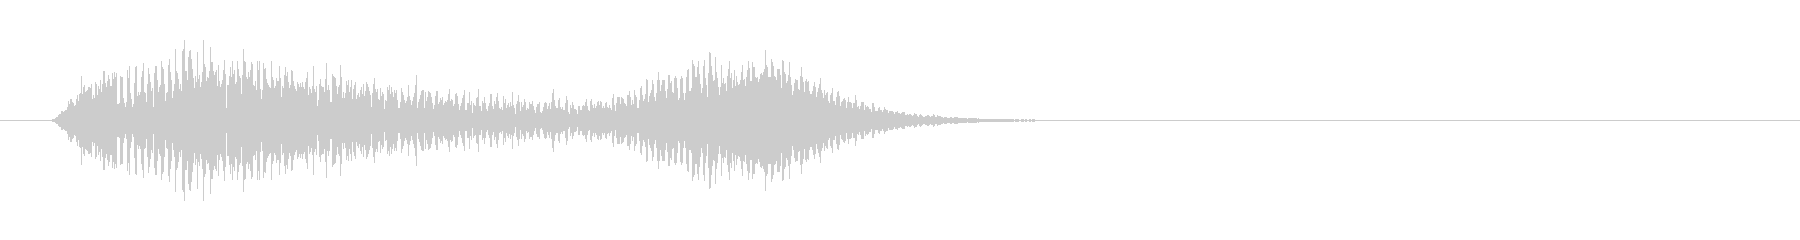 Stinger Electroni...の未再生の波形